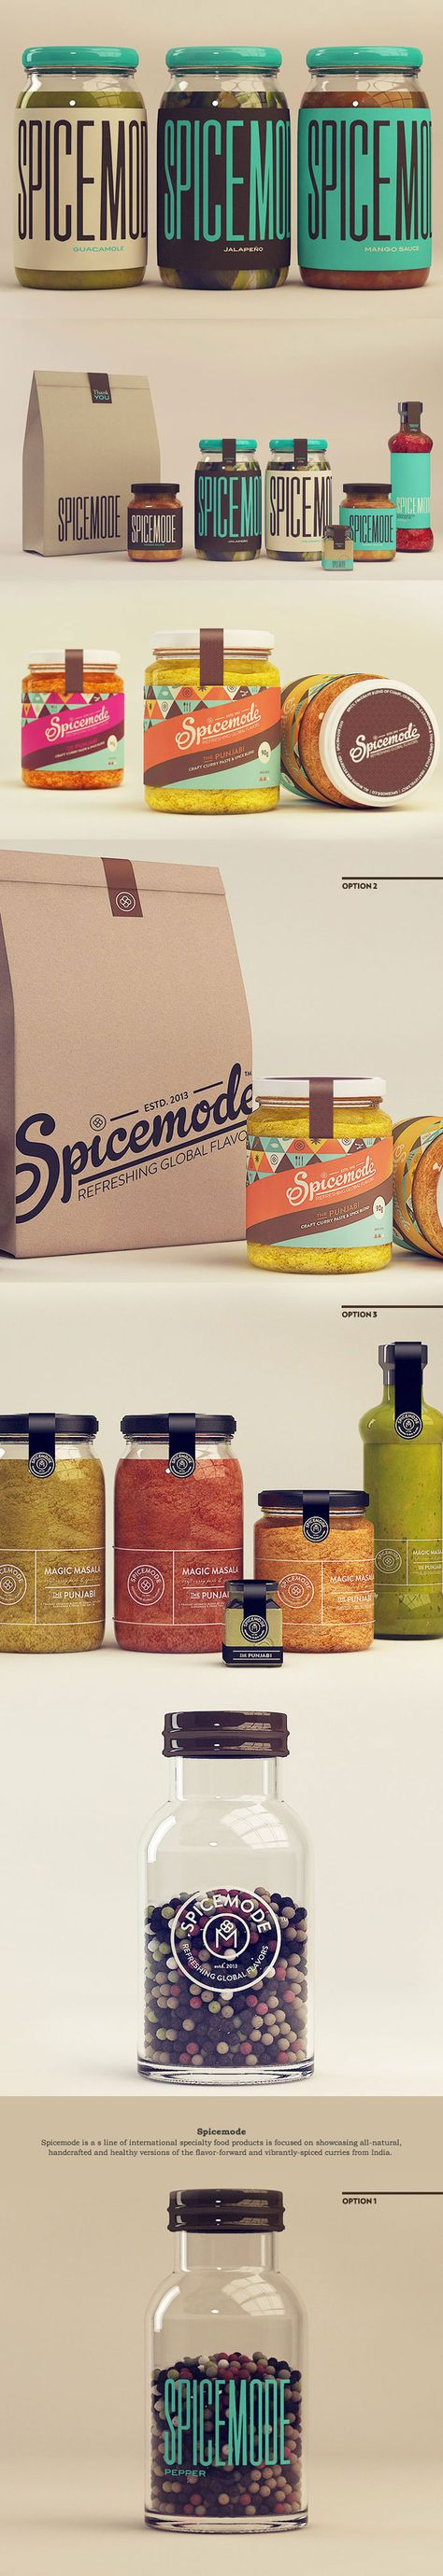 Branding #packaging design